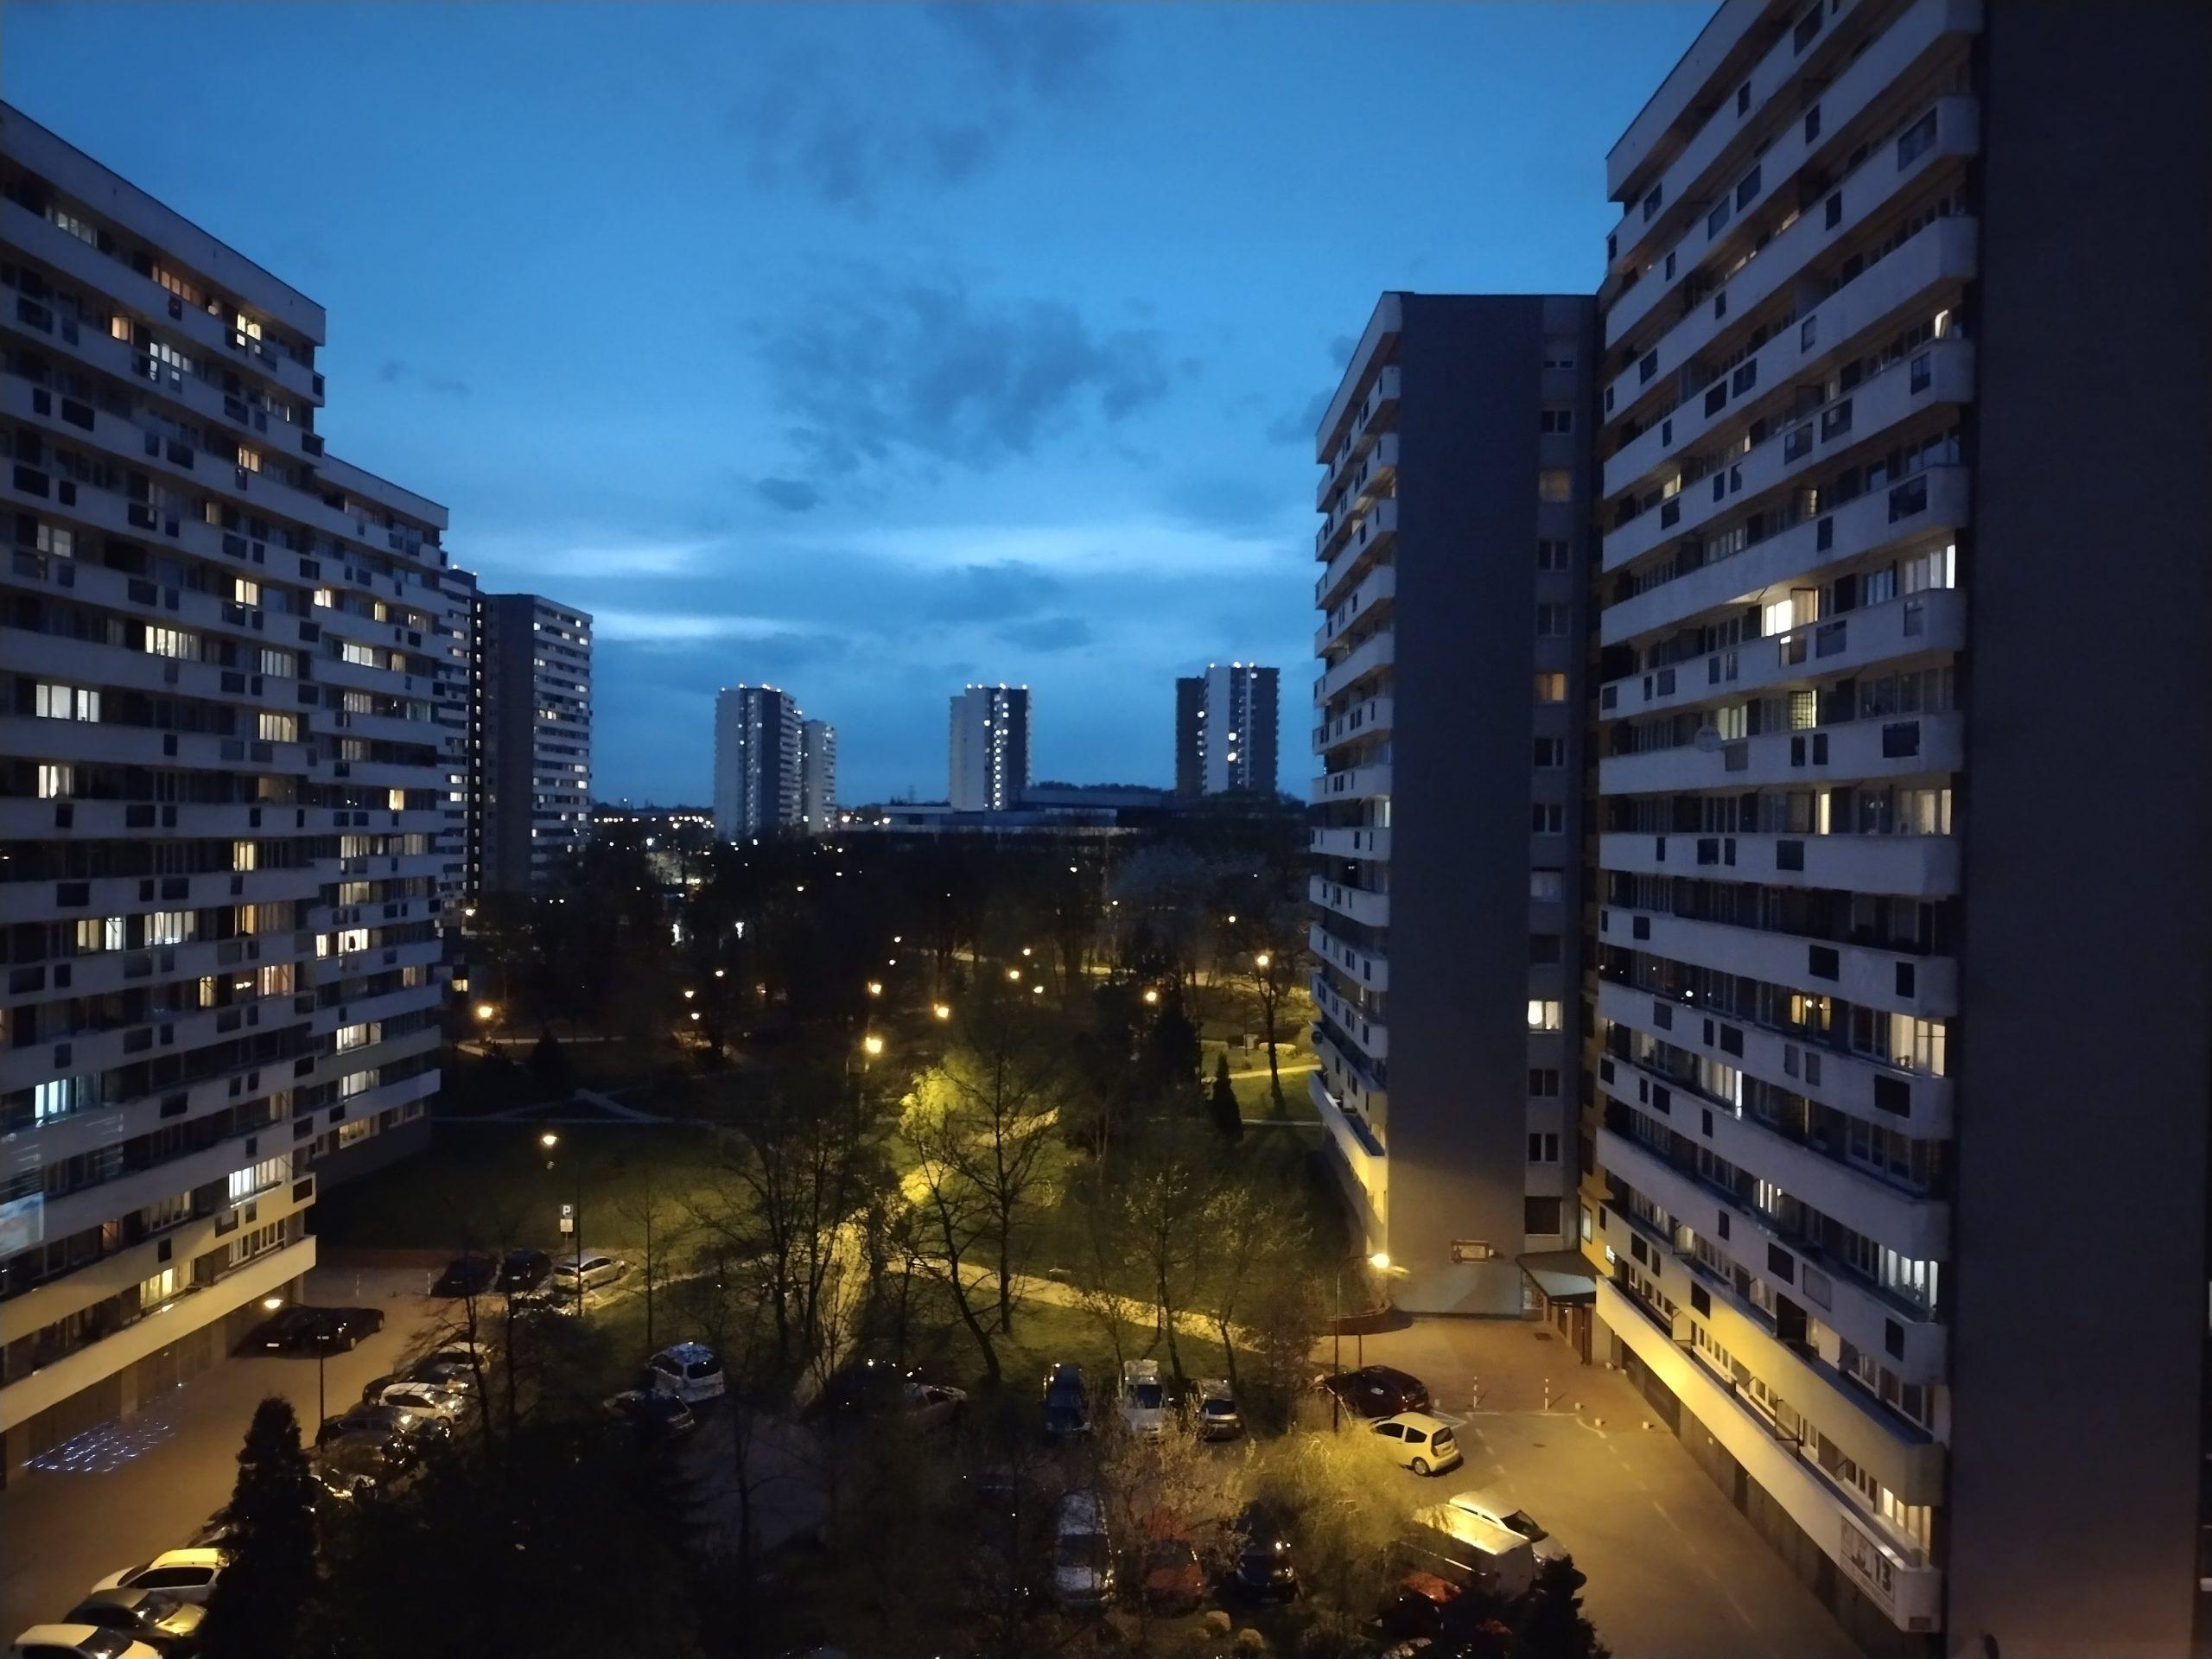 Zdjęcia nocne - Motorola Moto G50